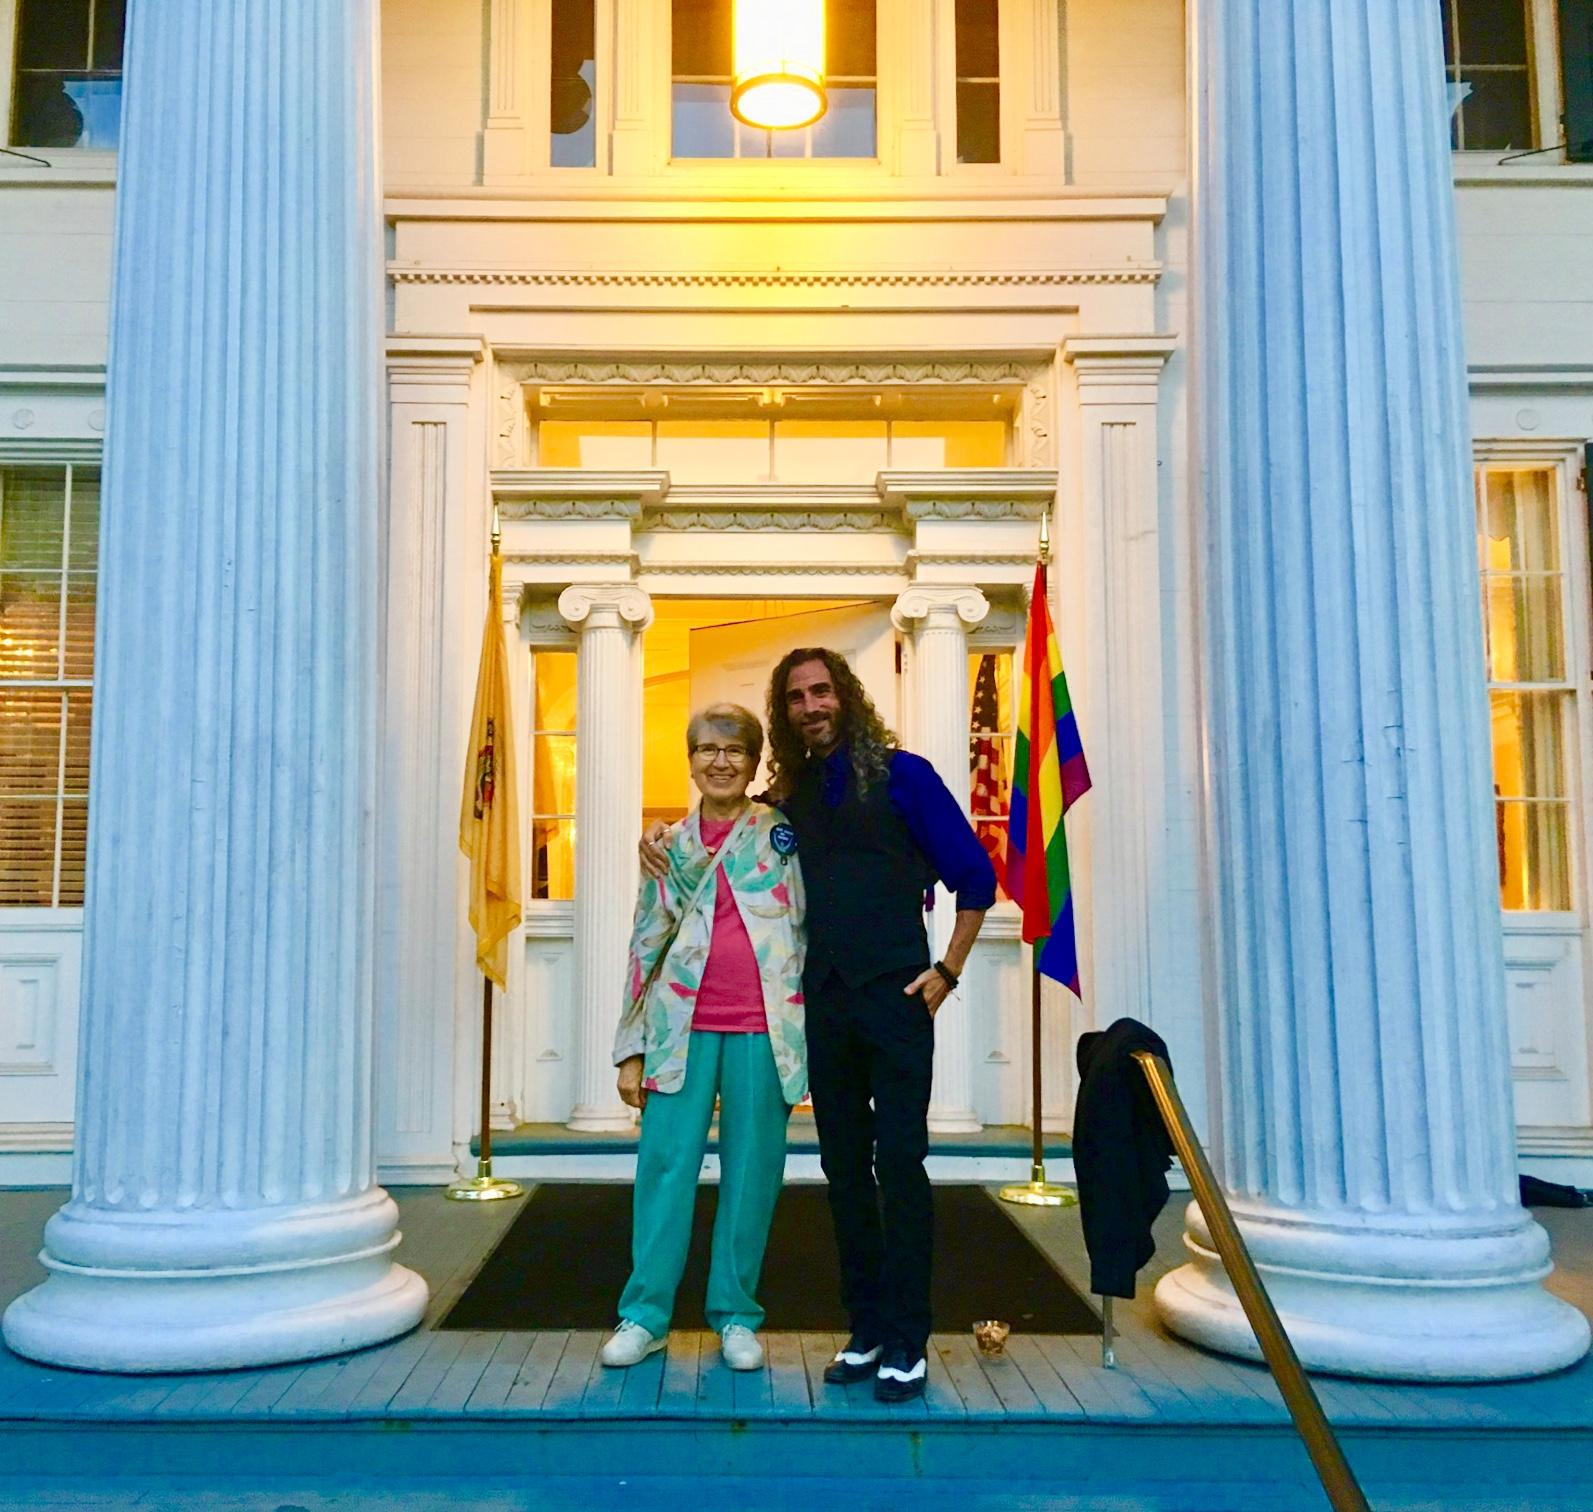 BRCSJ Chief Activist Robt Seda-Schreiber with Board Member Carol Watchler (proud @ Pride Reception, Governor's Mansion).jpg